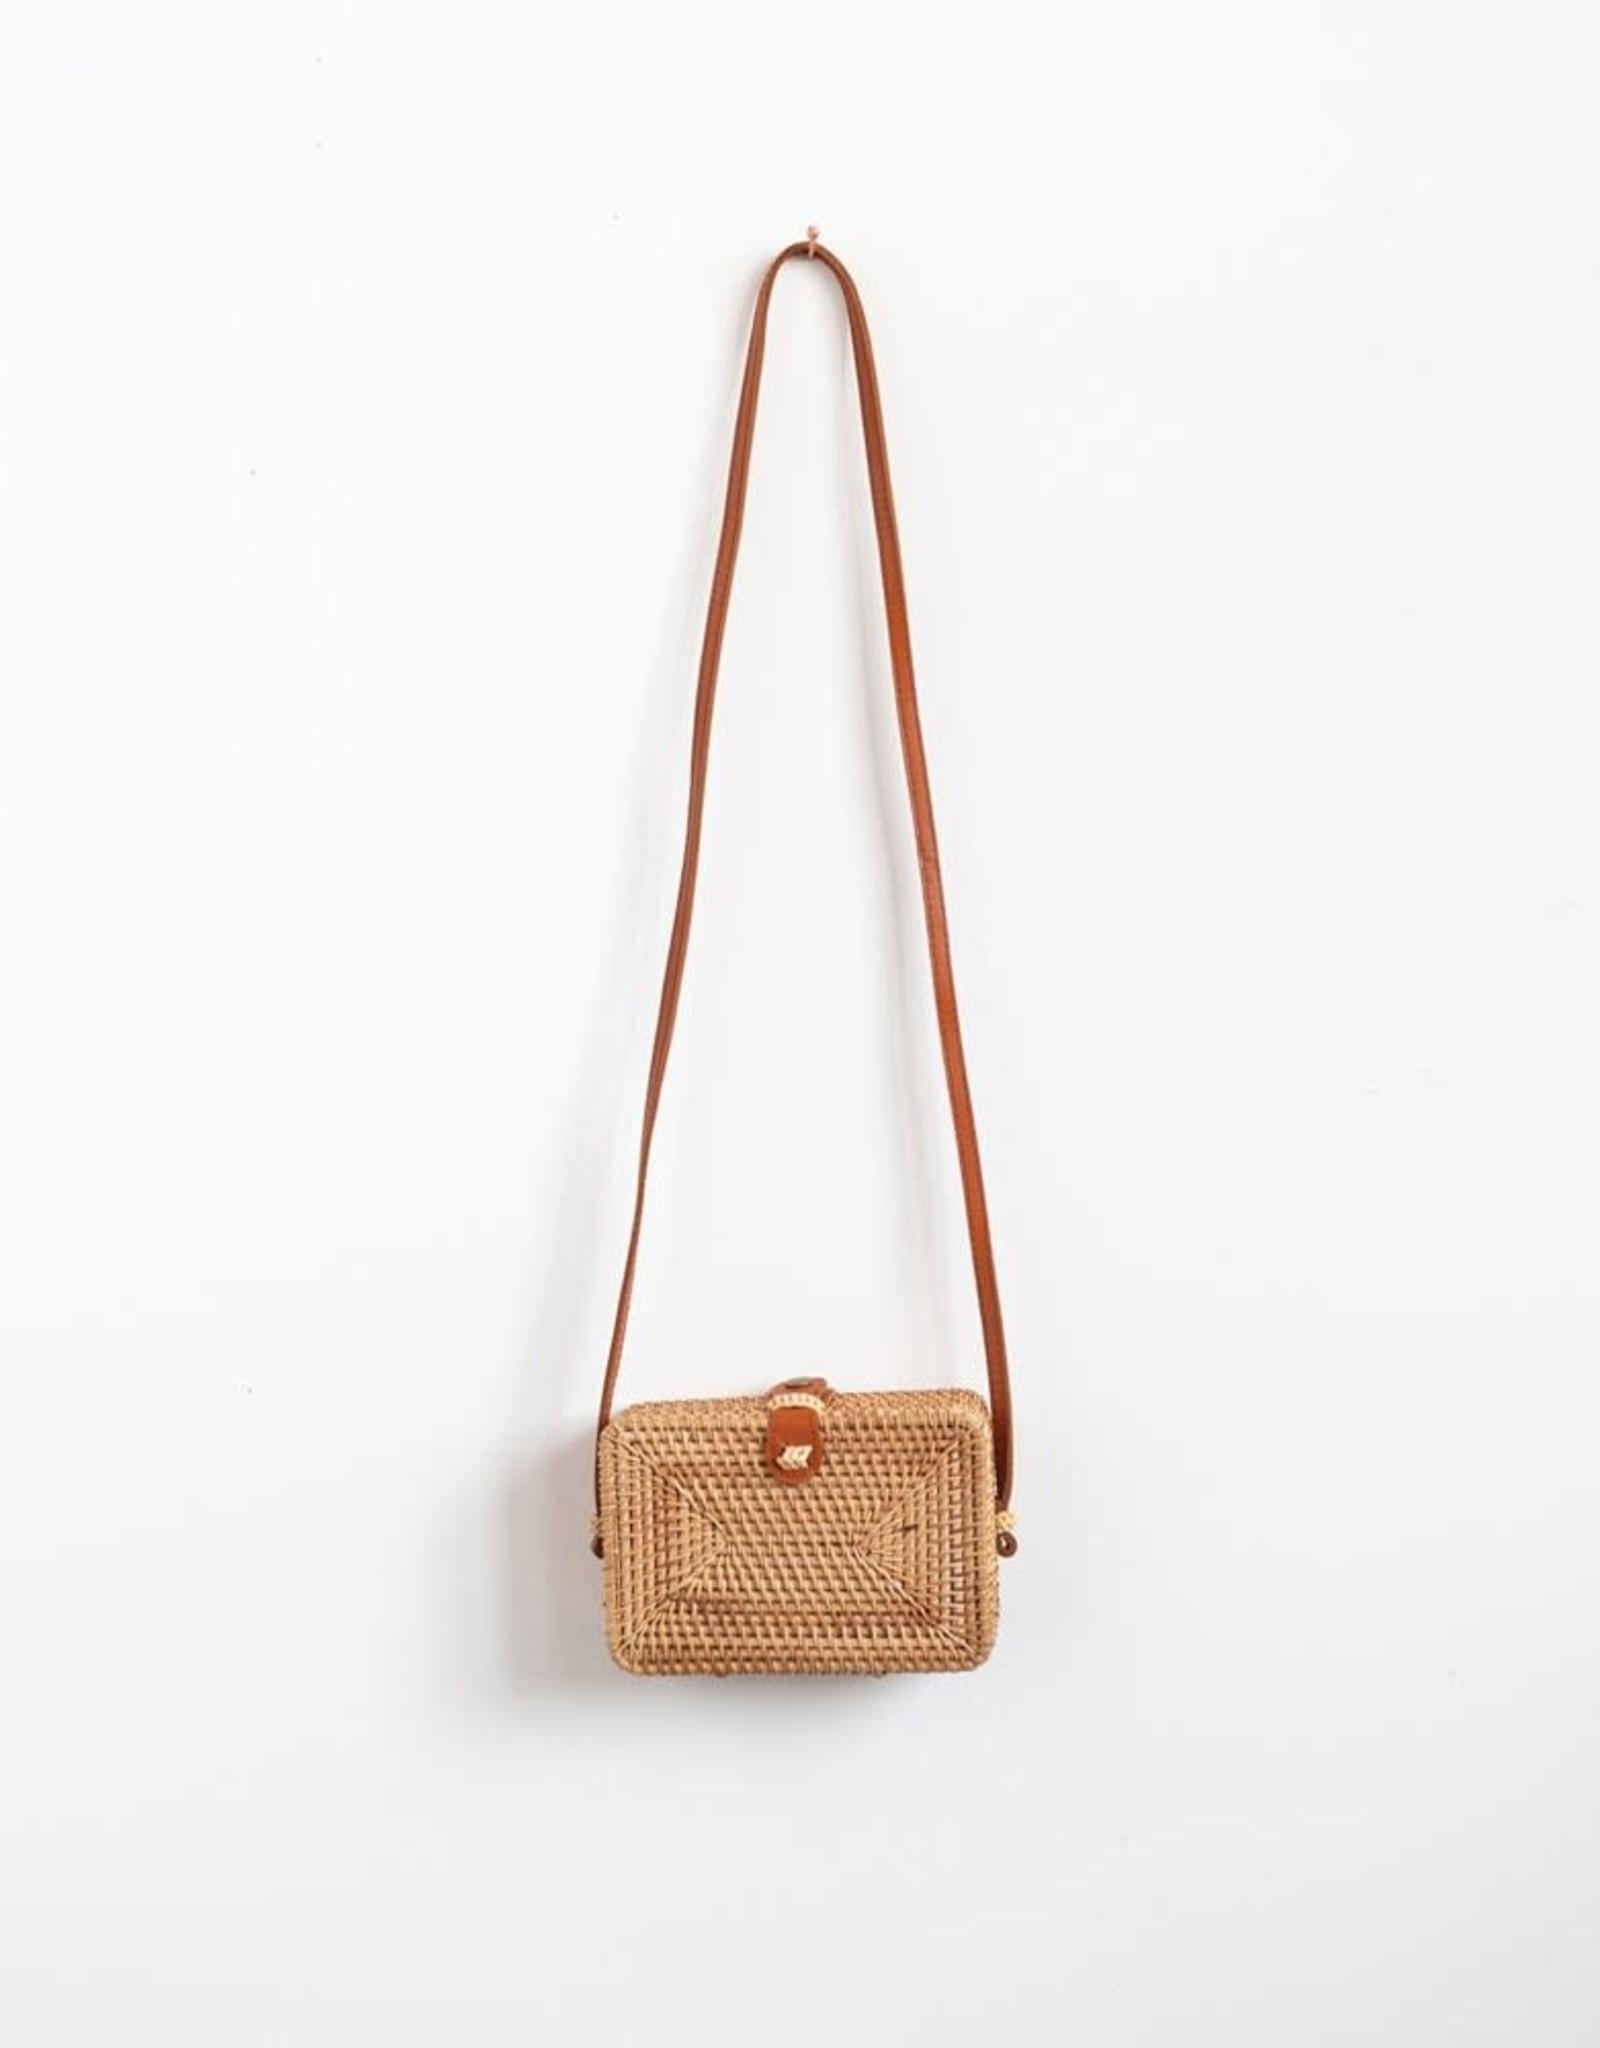 Woven Rattan Shoulder Bag